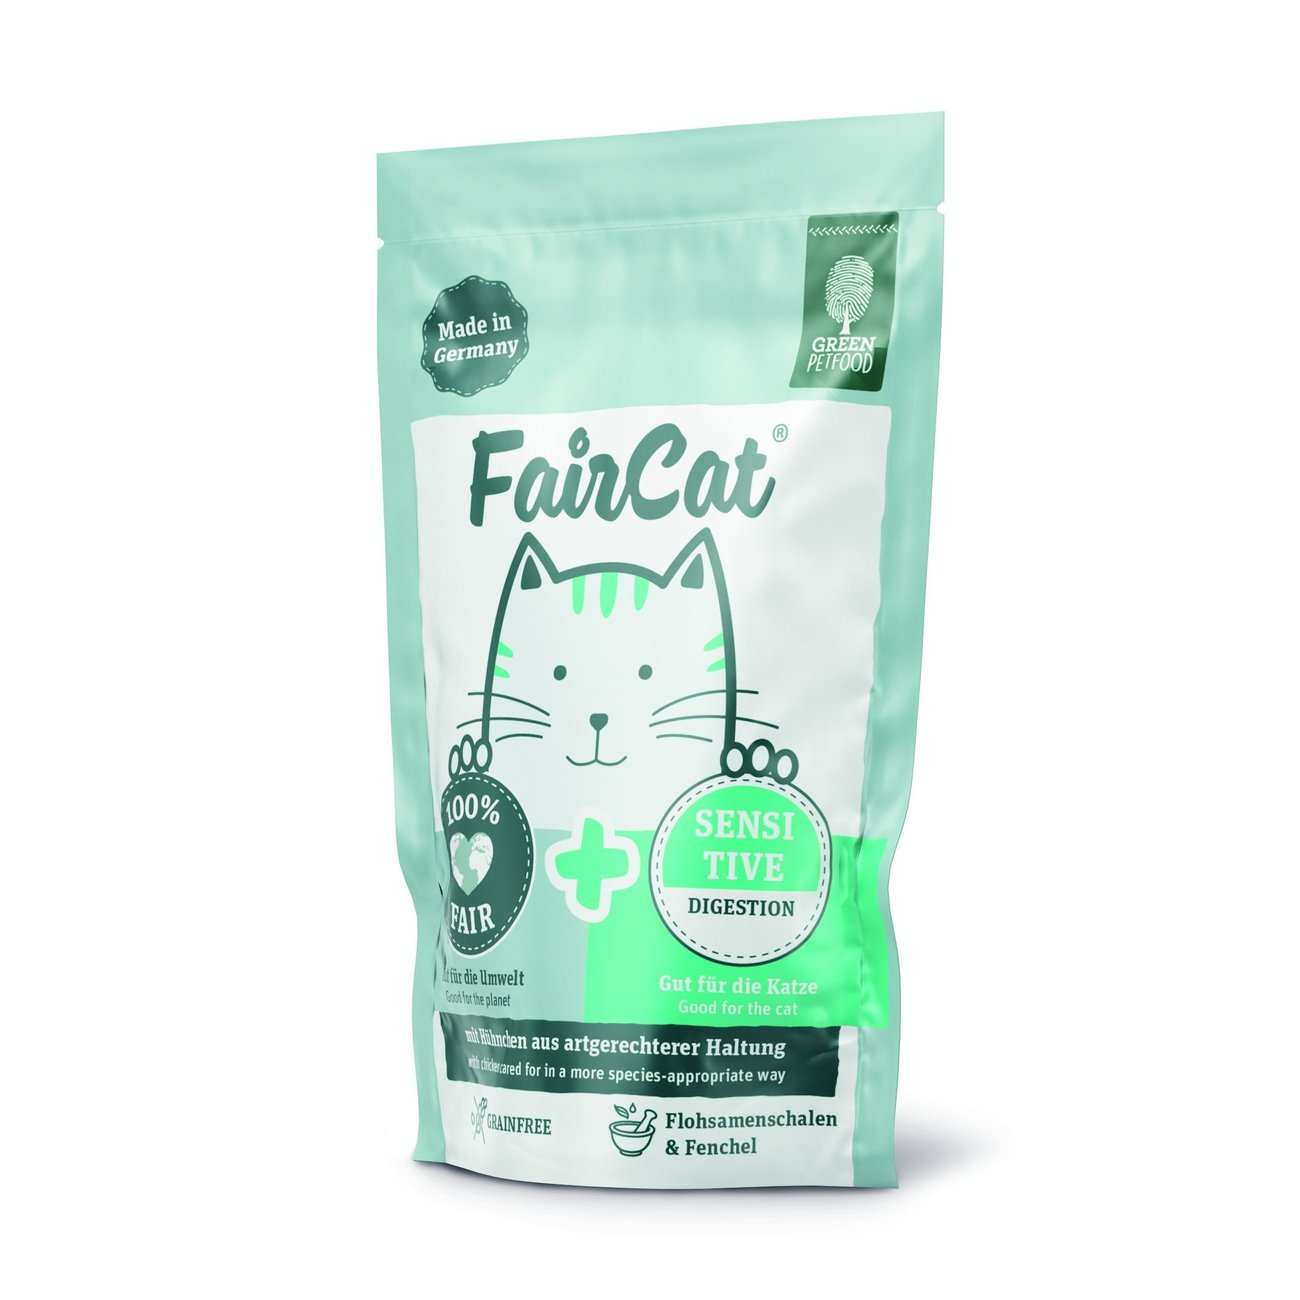 Green Petfood FairCat Sensitive Katzenfutter, Bild 2